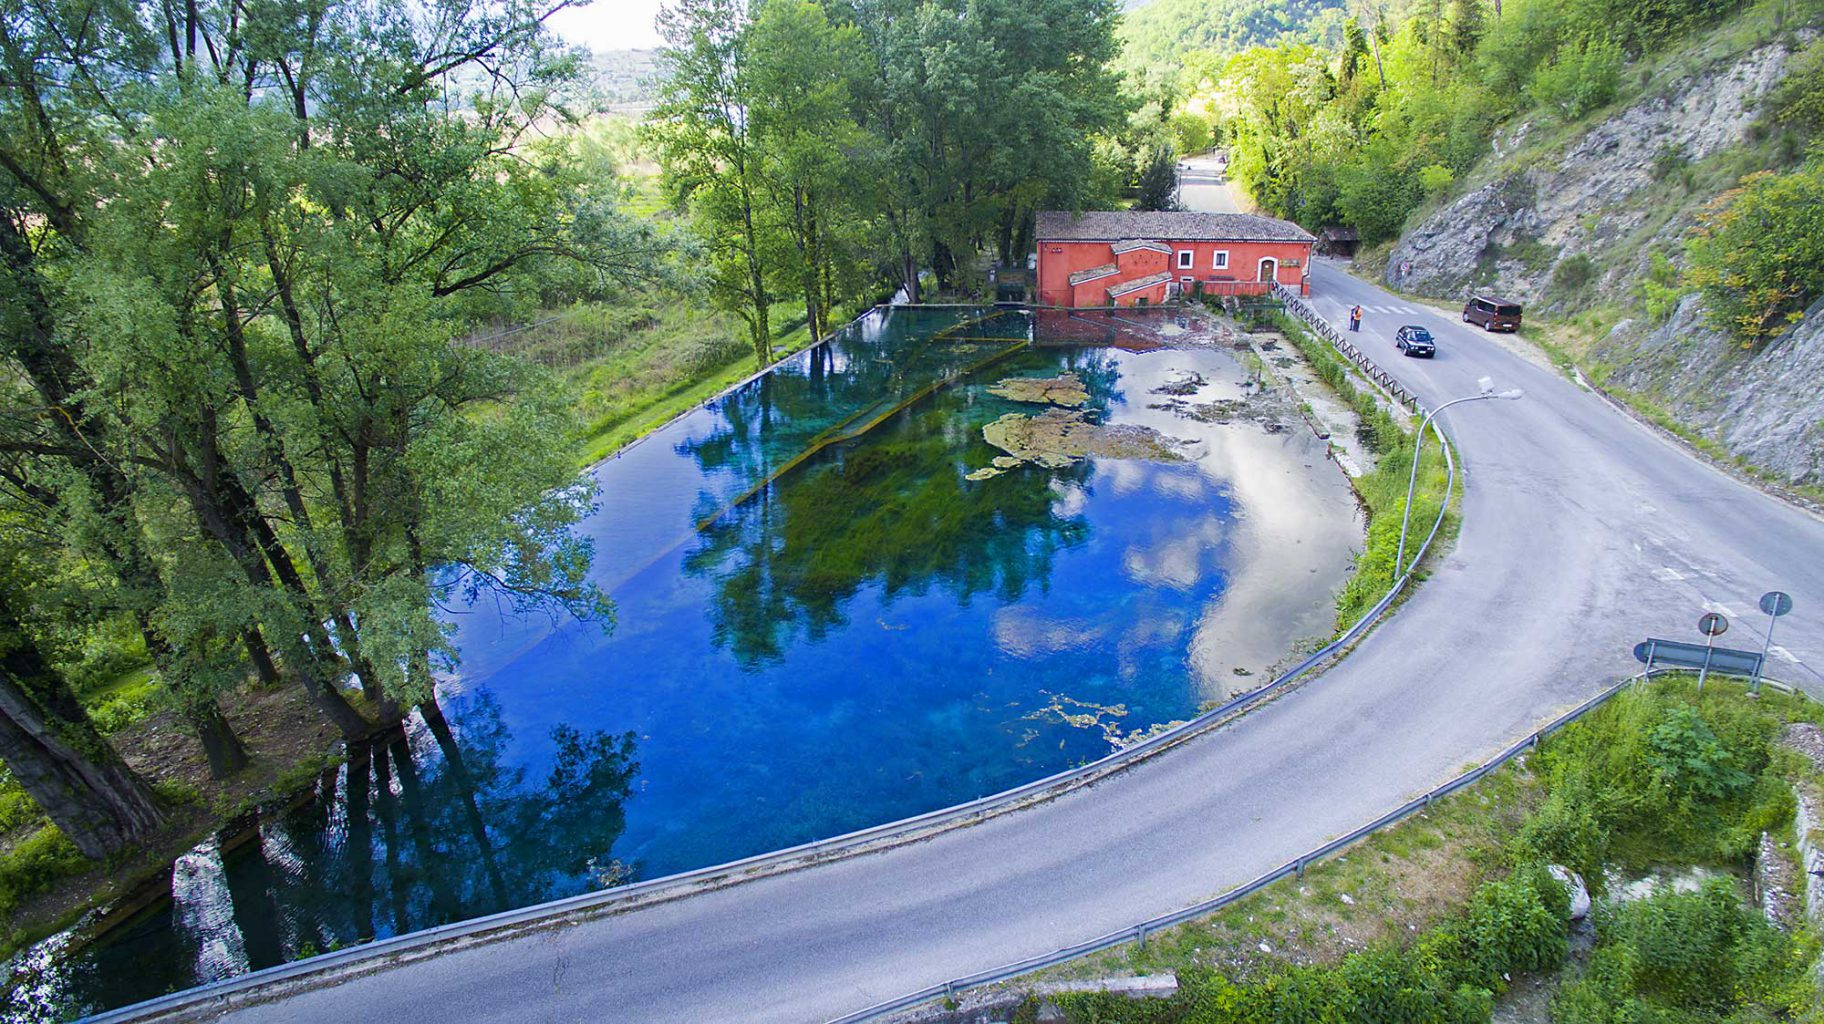 Spring Water Pond, Posta Fibreno, Italy